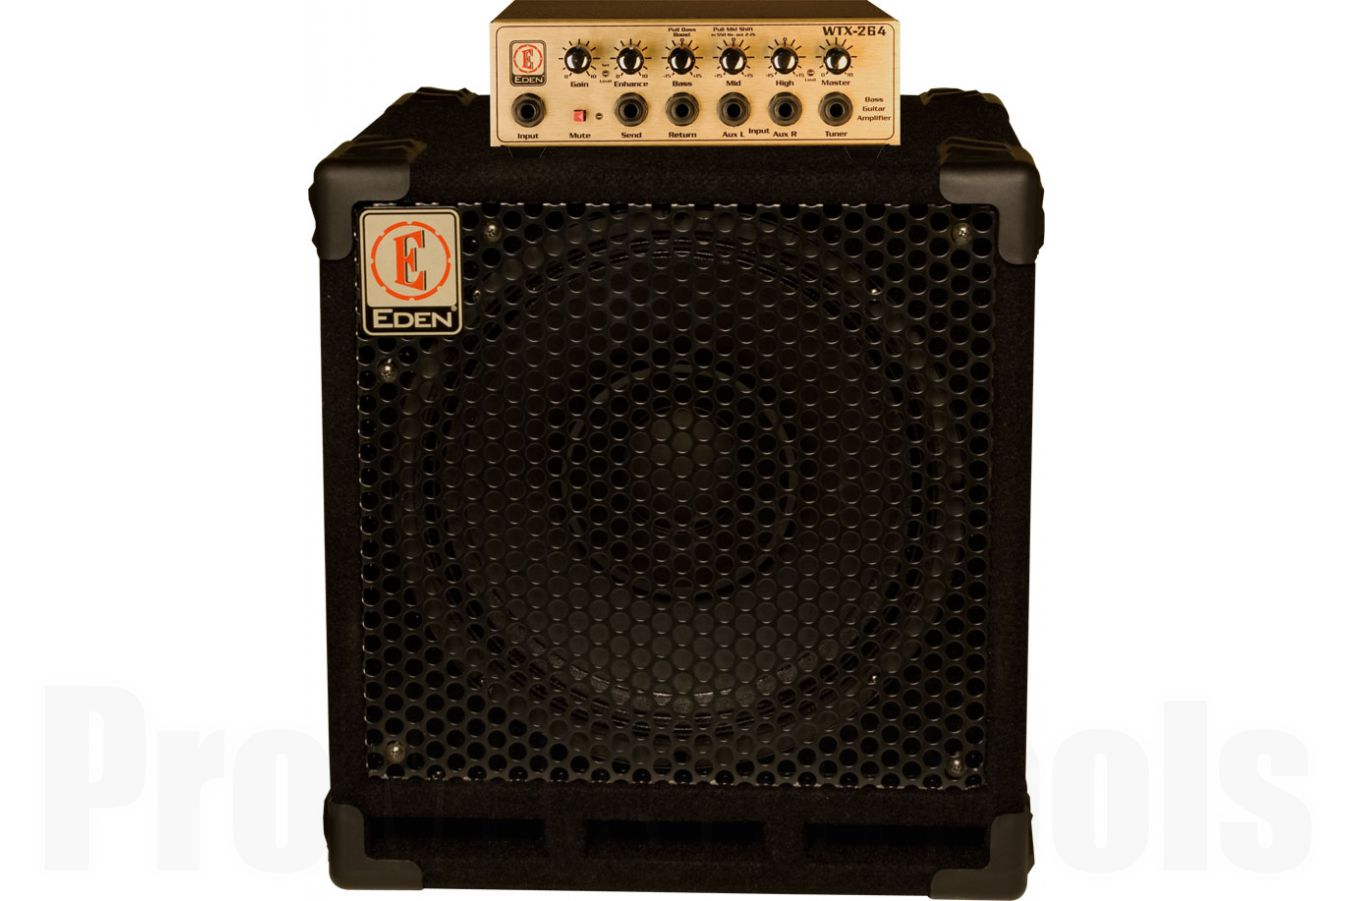 Eden EGRW1264 bass bundle package: WTX264 head, EX112 cabinet & gigbag